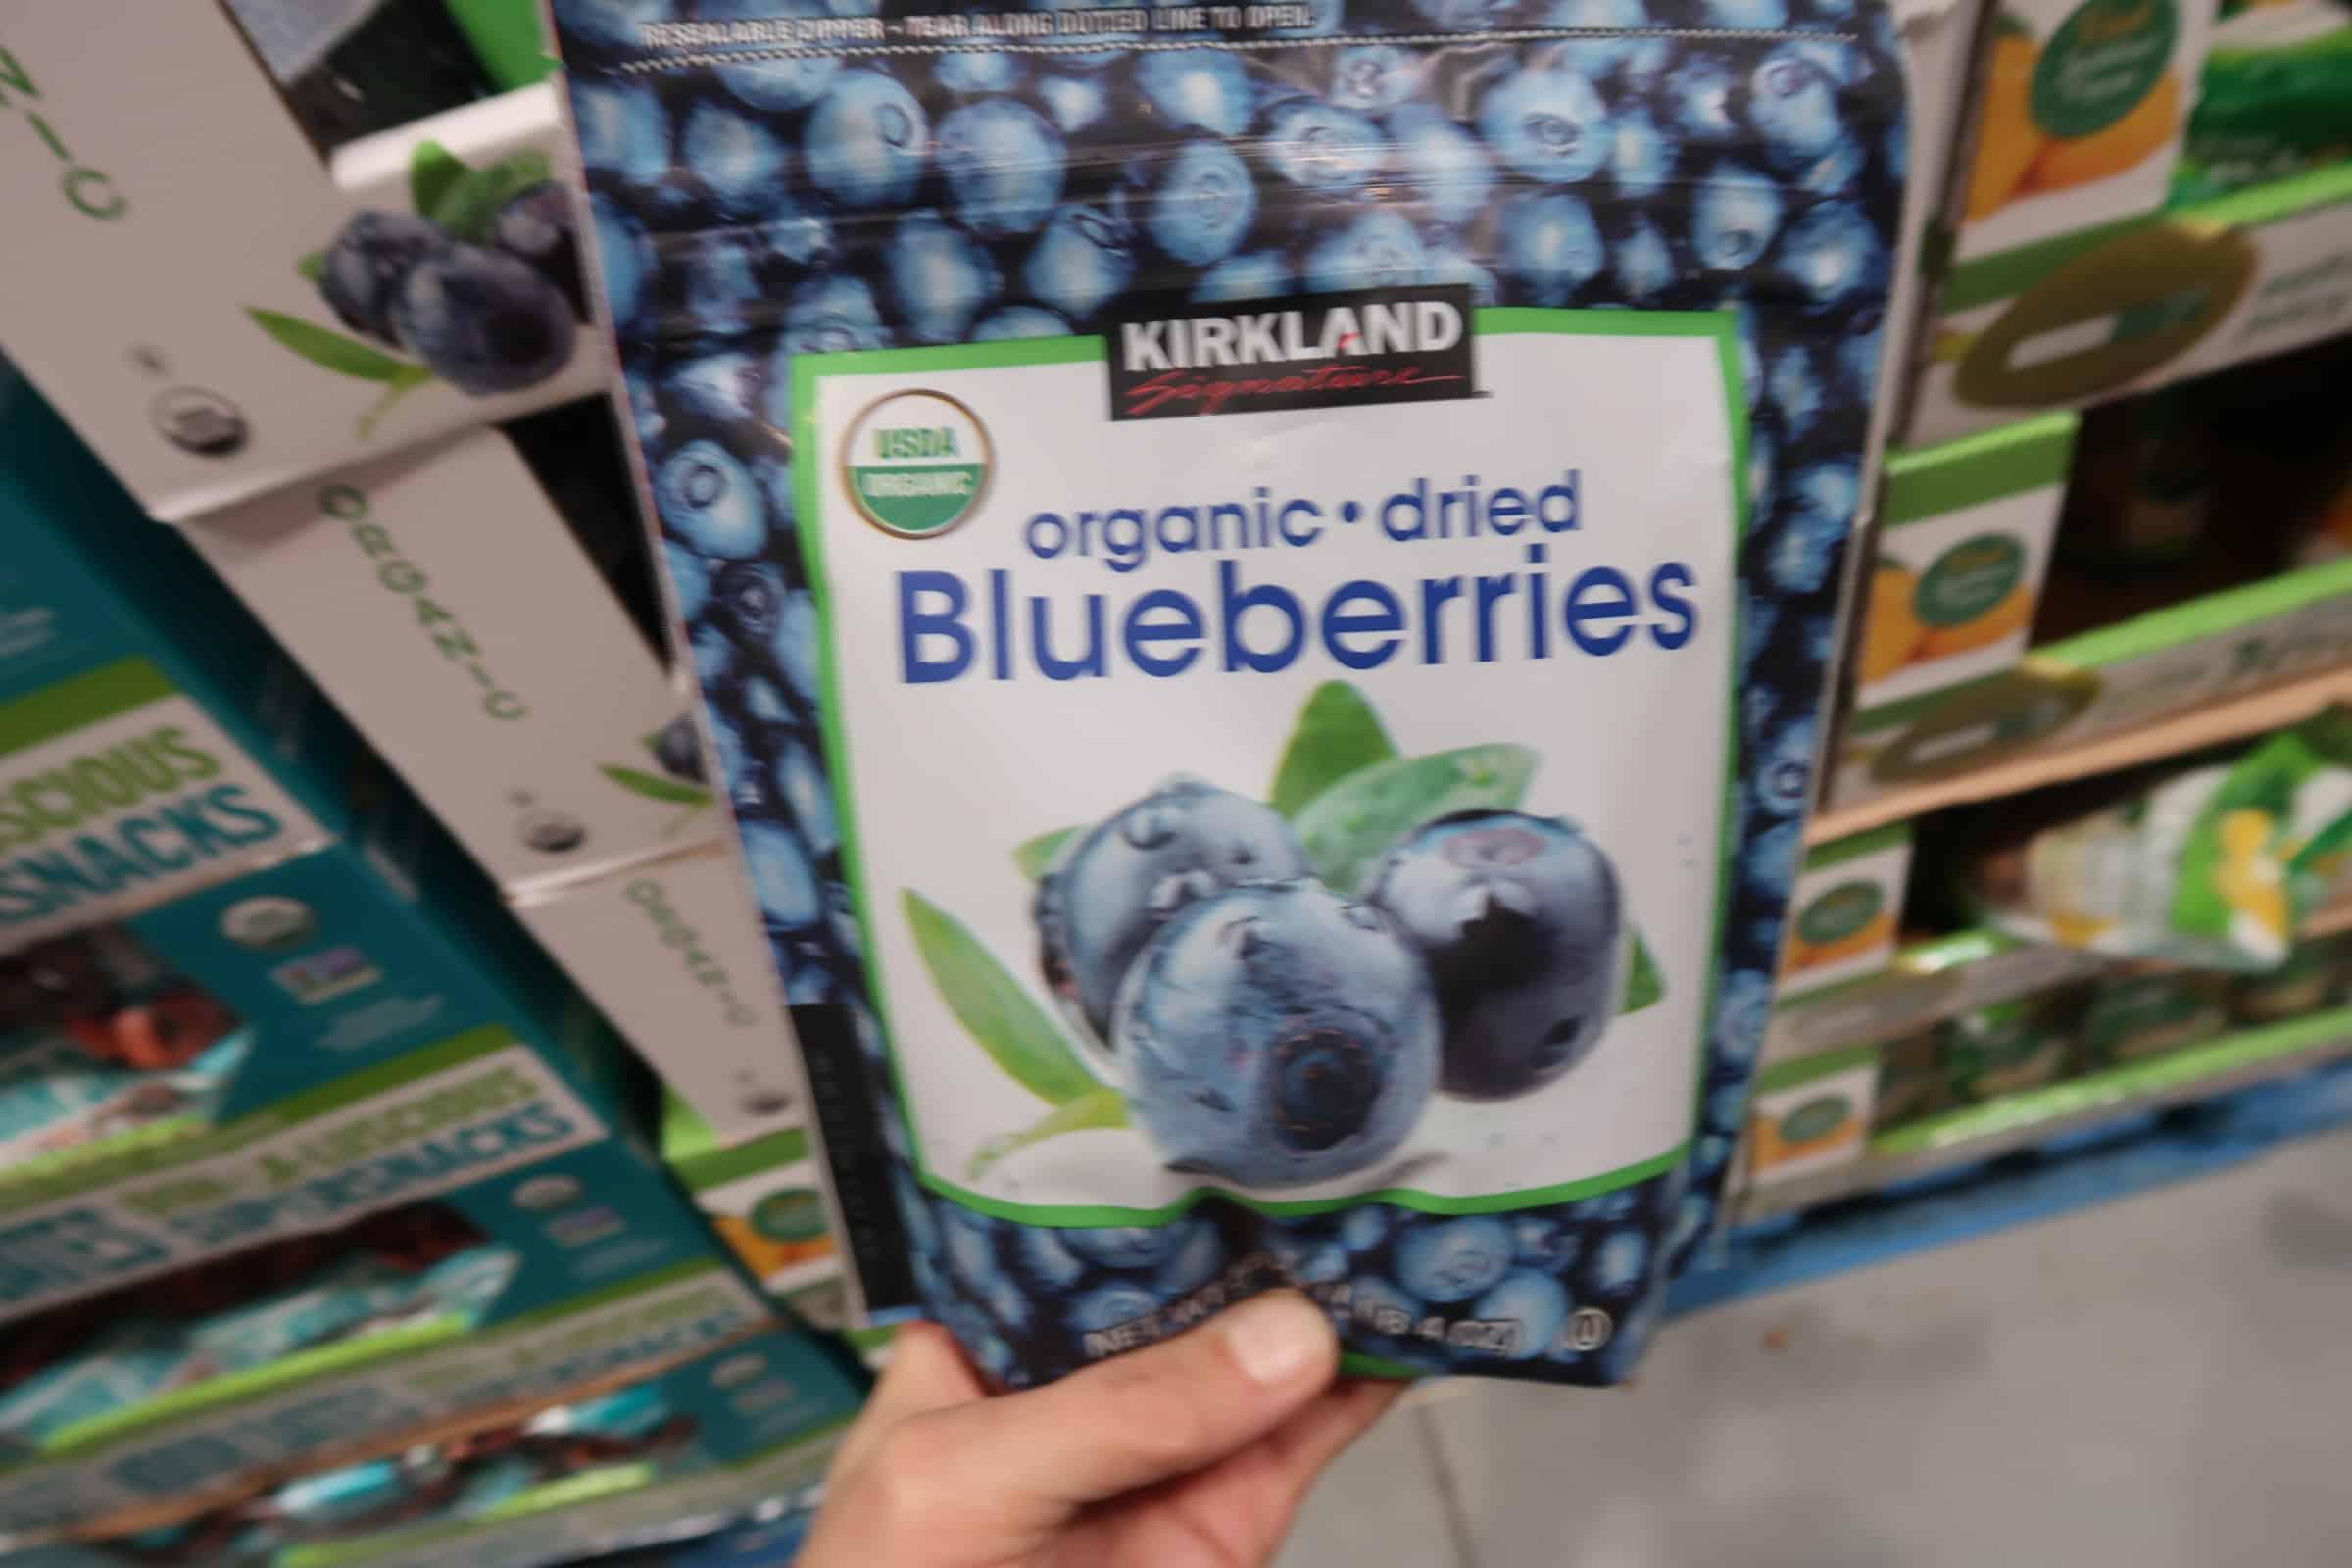 Kirkland Organic Dried Blueberries $4.97